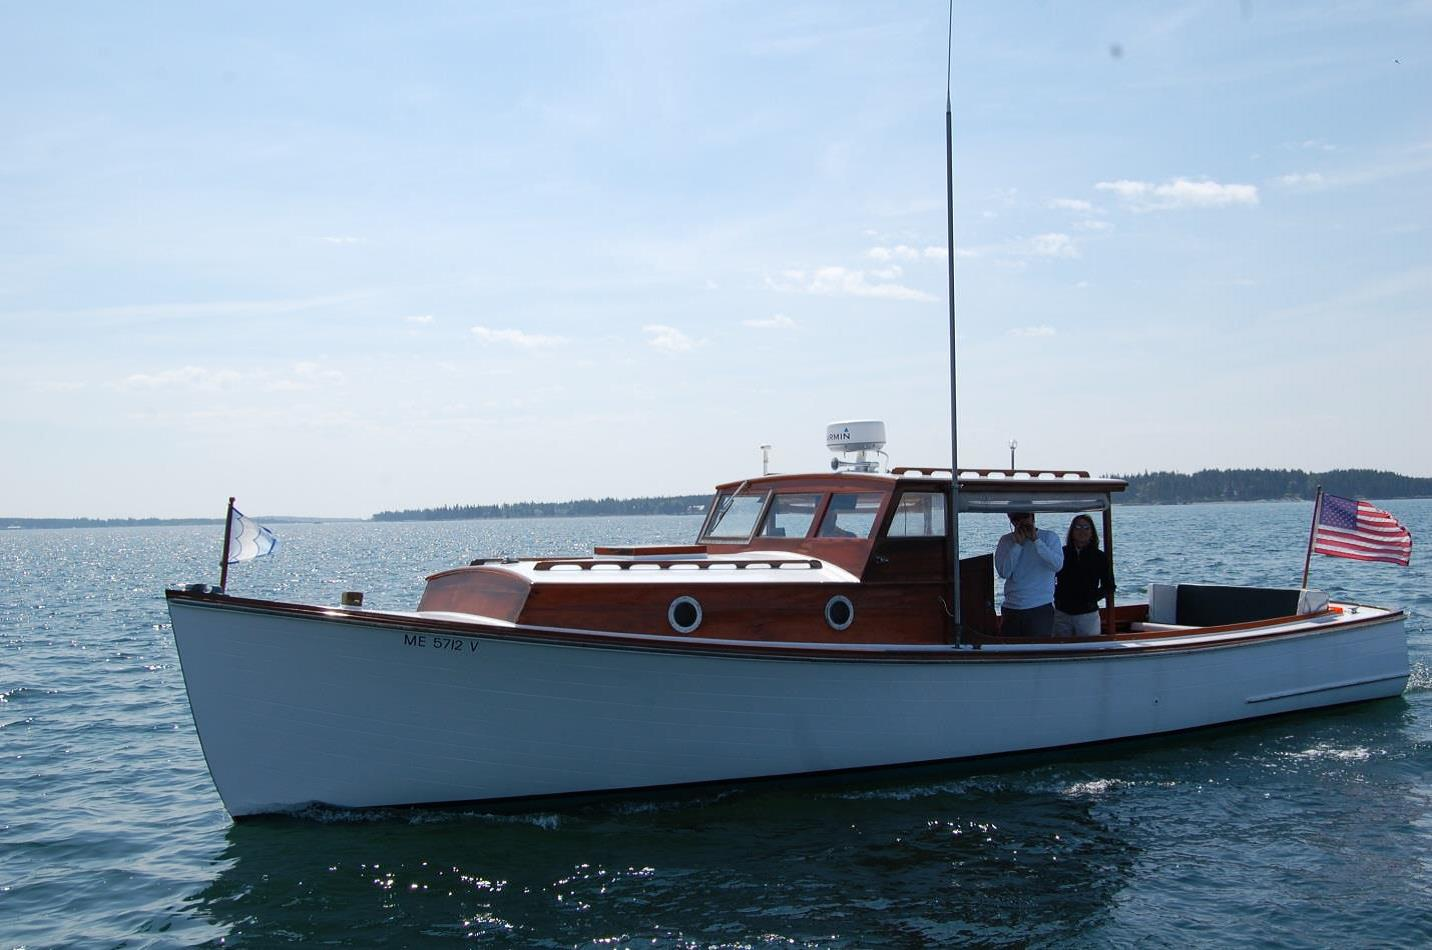 Boats yachts maine boats lobster boats picnic boats sailing - Mv Adequate Maine Built 60yearold Wooden Boat